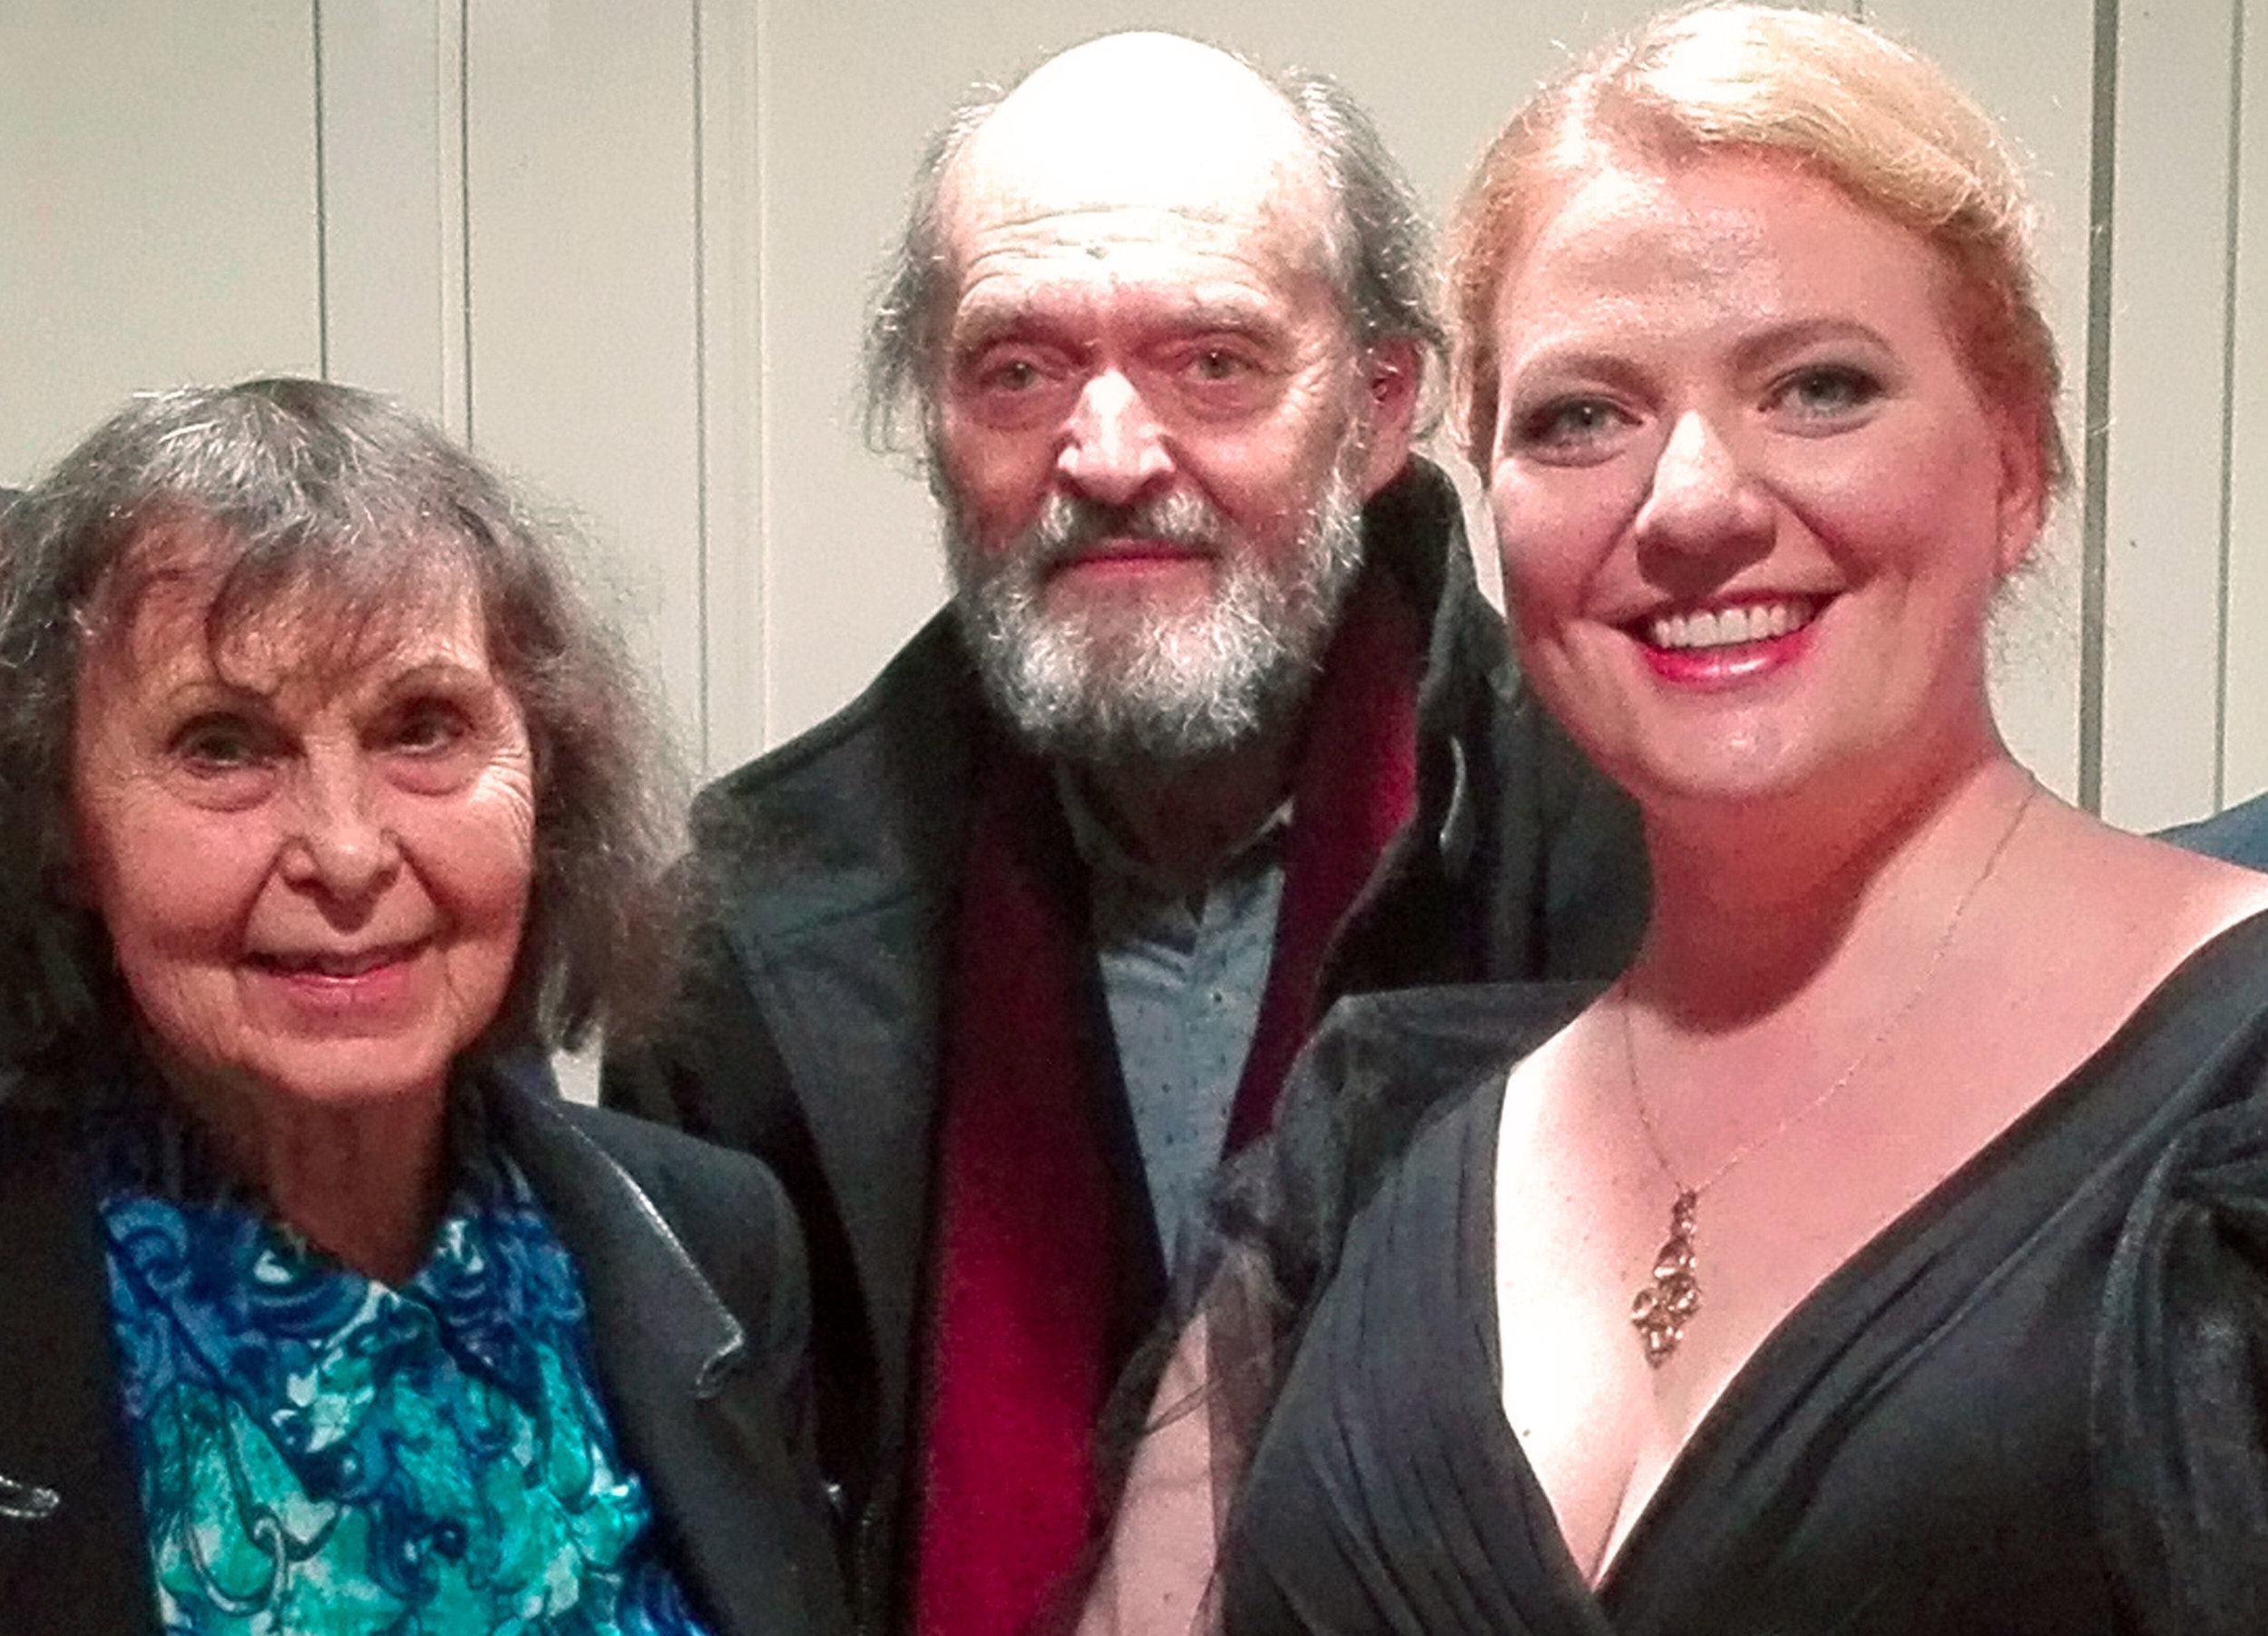 Sofia Gubaidulina, Arvo Pärt and Aile Asszony (Tallinn, October 2016)